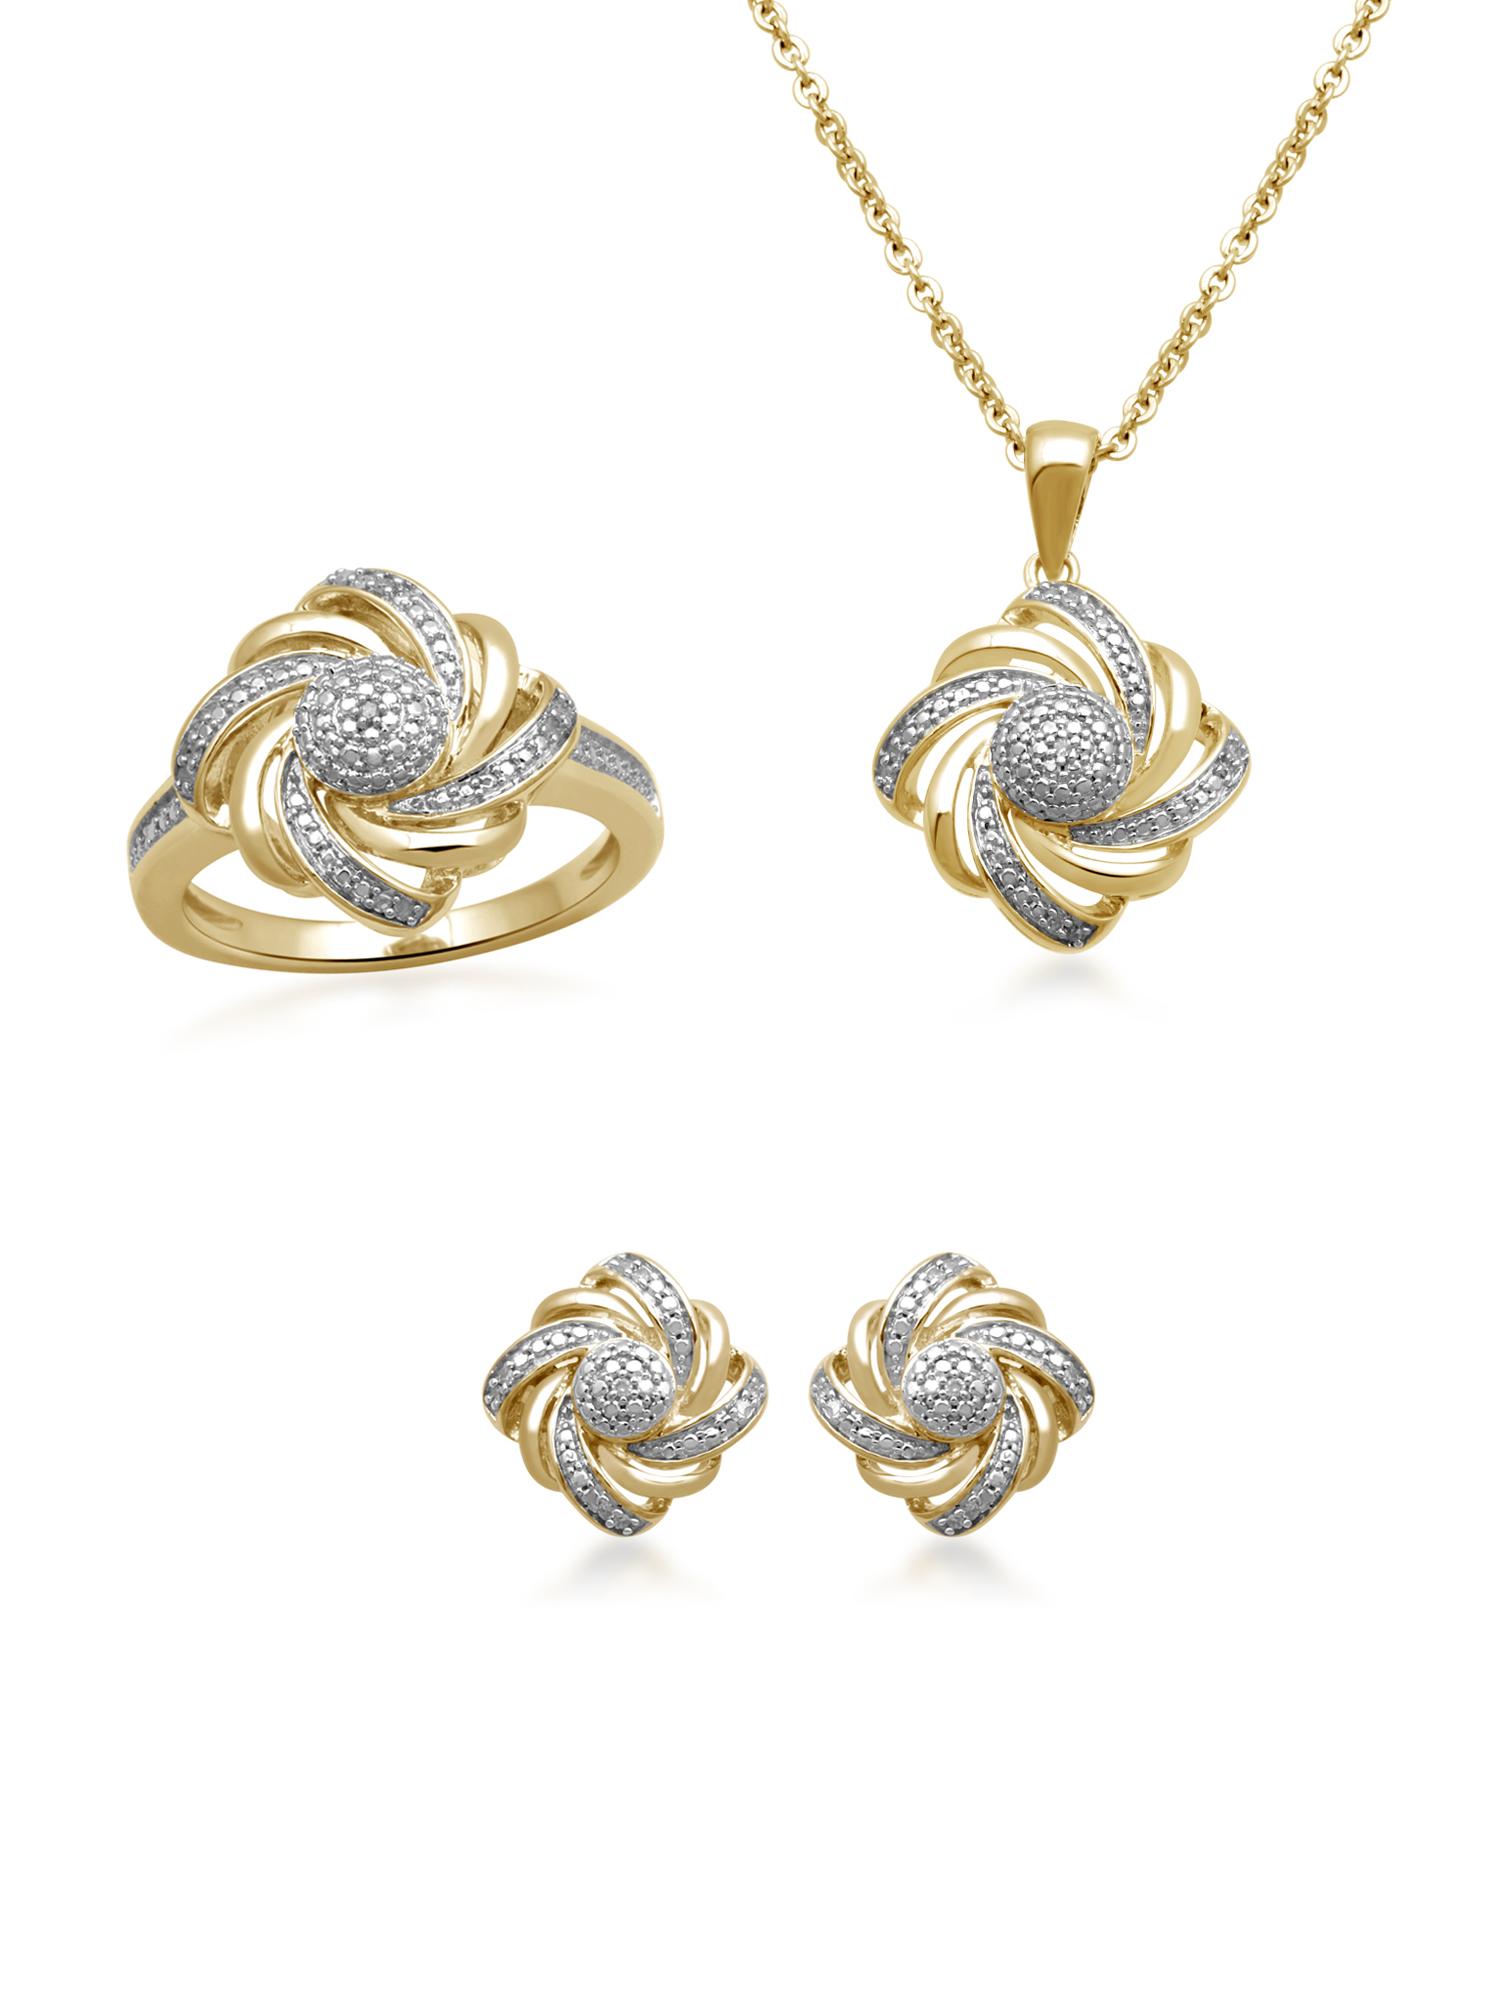 1/10 Carat T.W. Diamond 14kt Gold over Brass Boxed 3-Piece Wave Jewelry Set